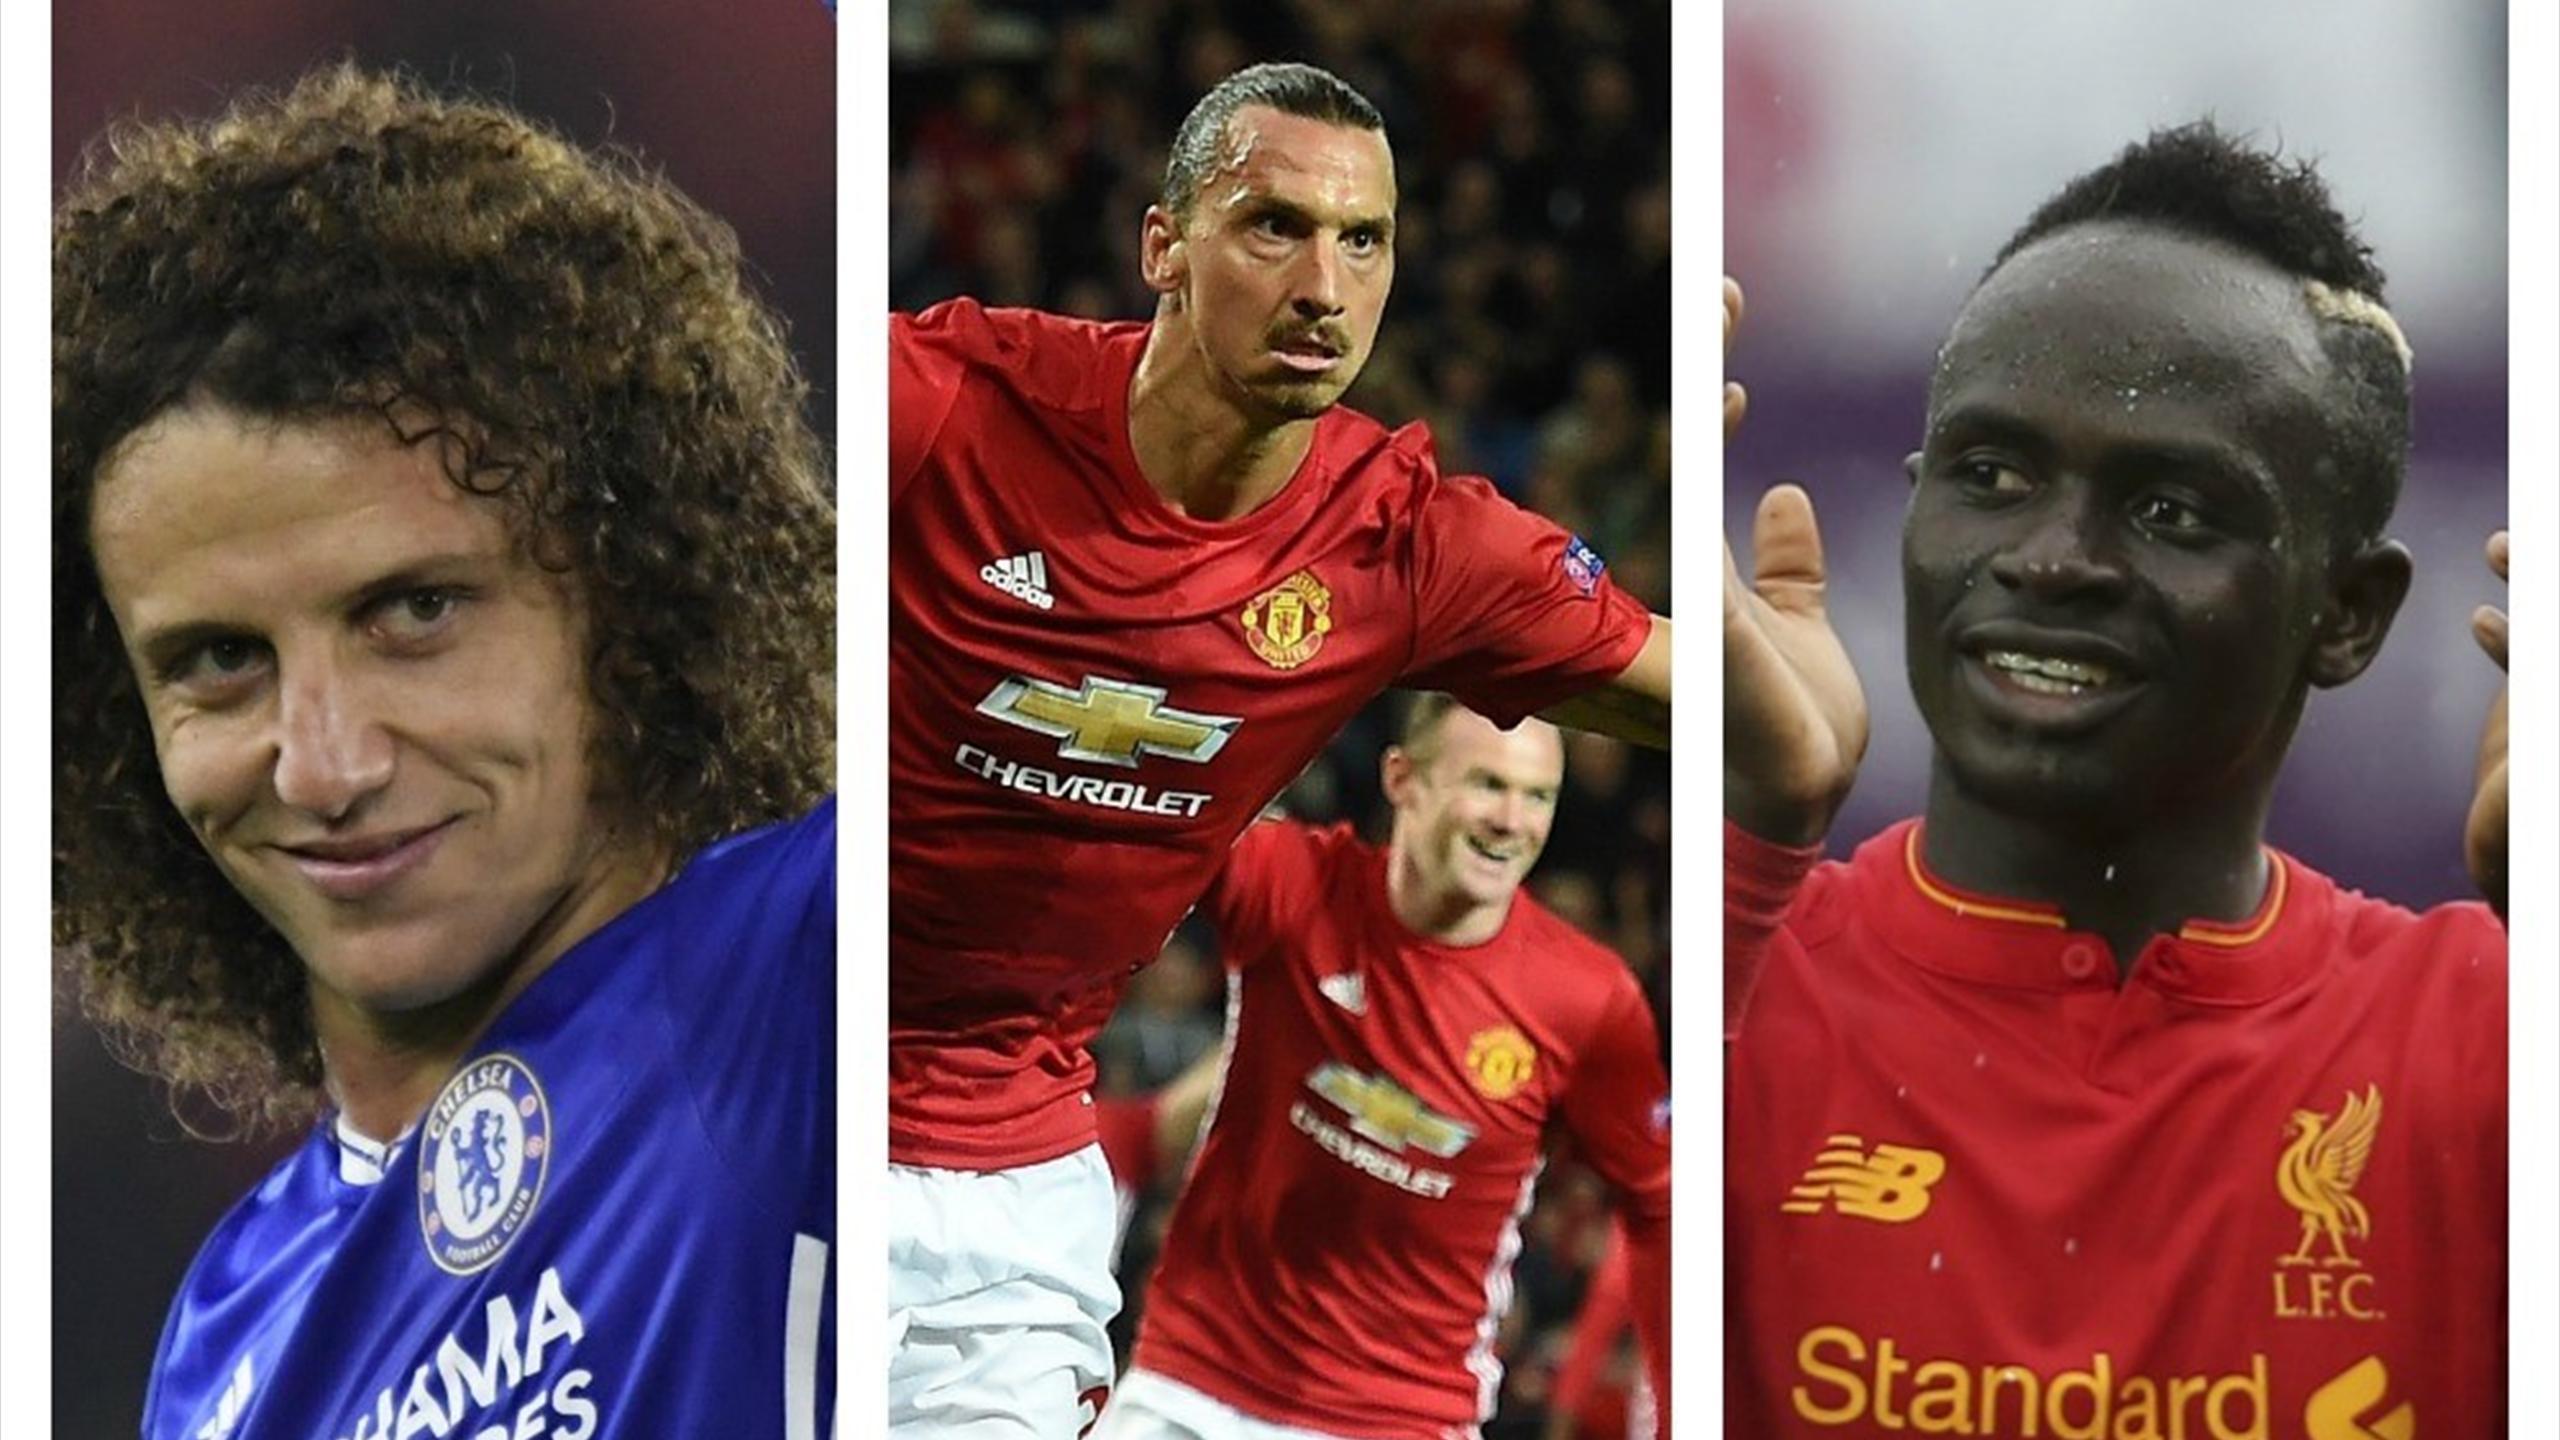 David Luiz, Zlatan Ibrahimovic and Sadio Mane